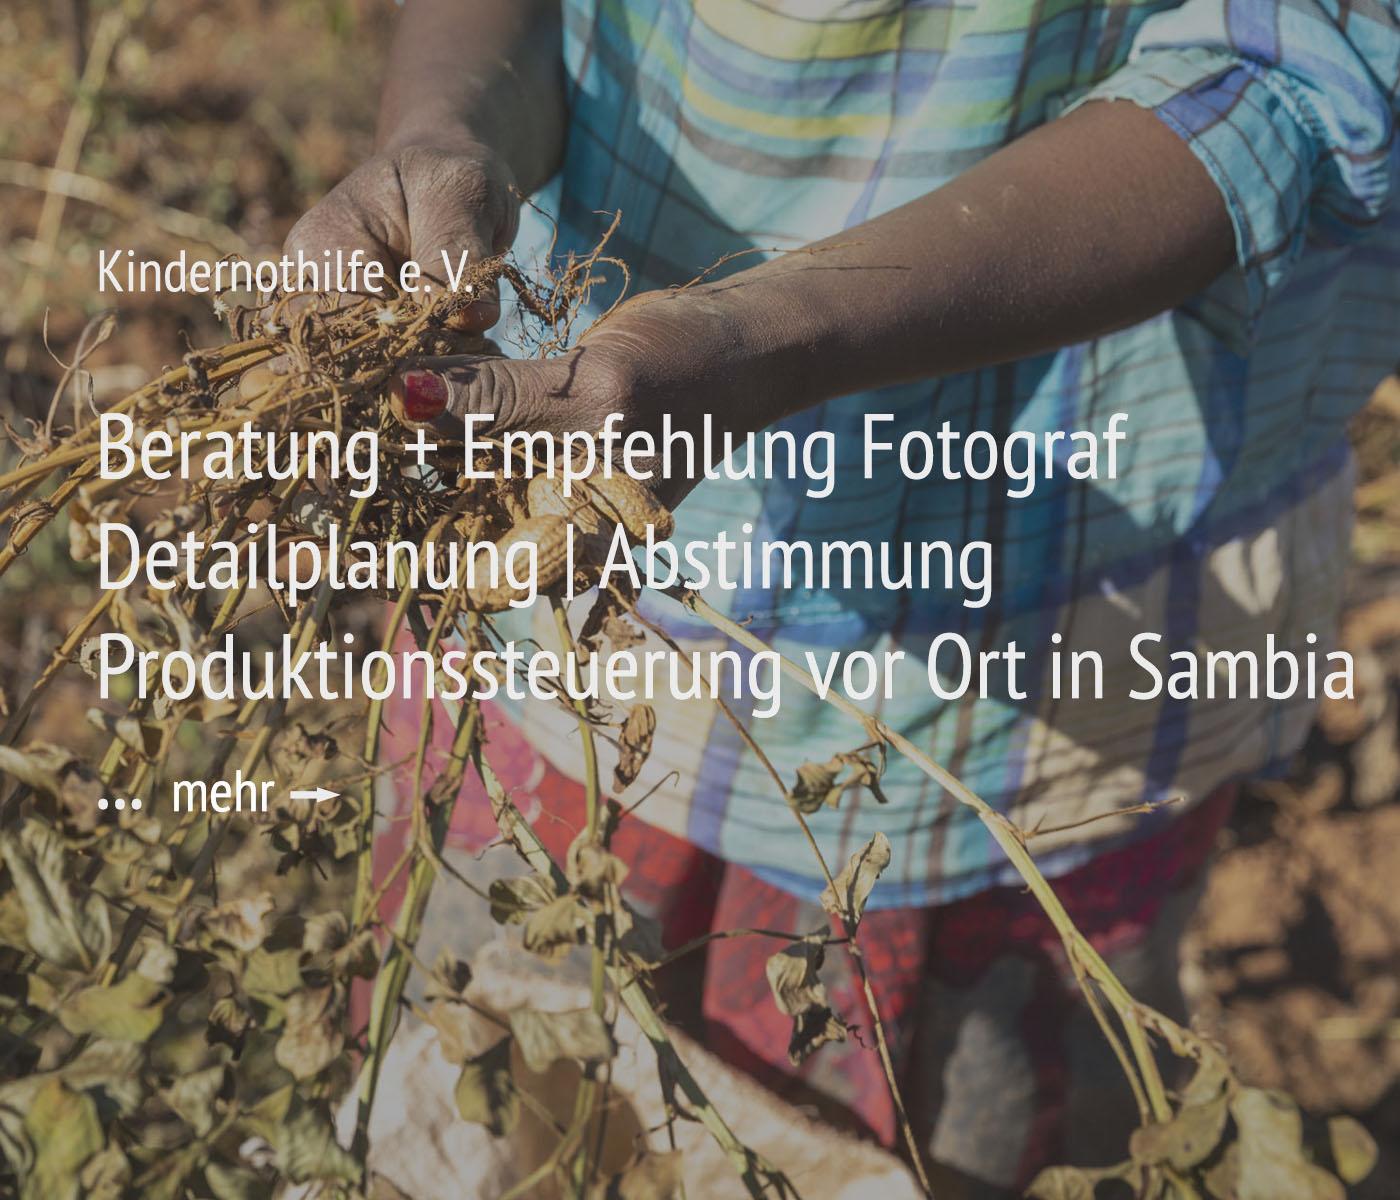 Portraitfotografie + Projektmanagement + Organisation für die Kindernothilfe e.V.